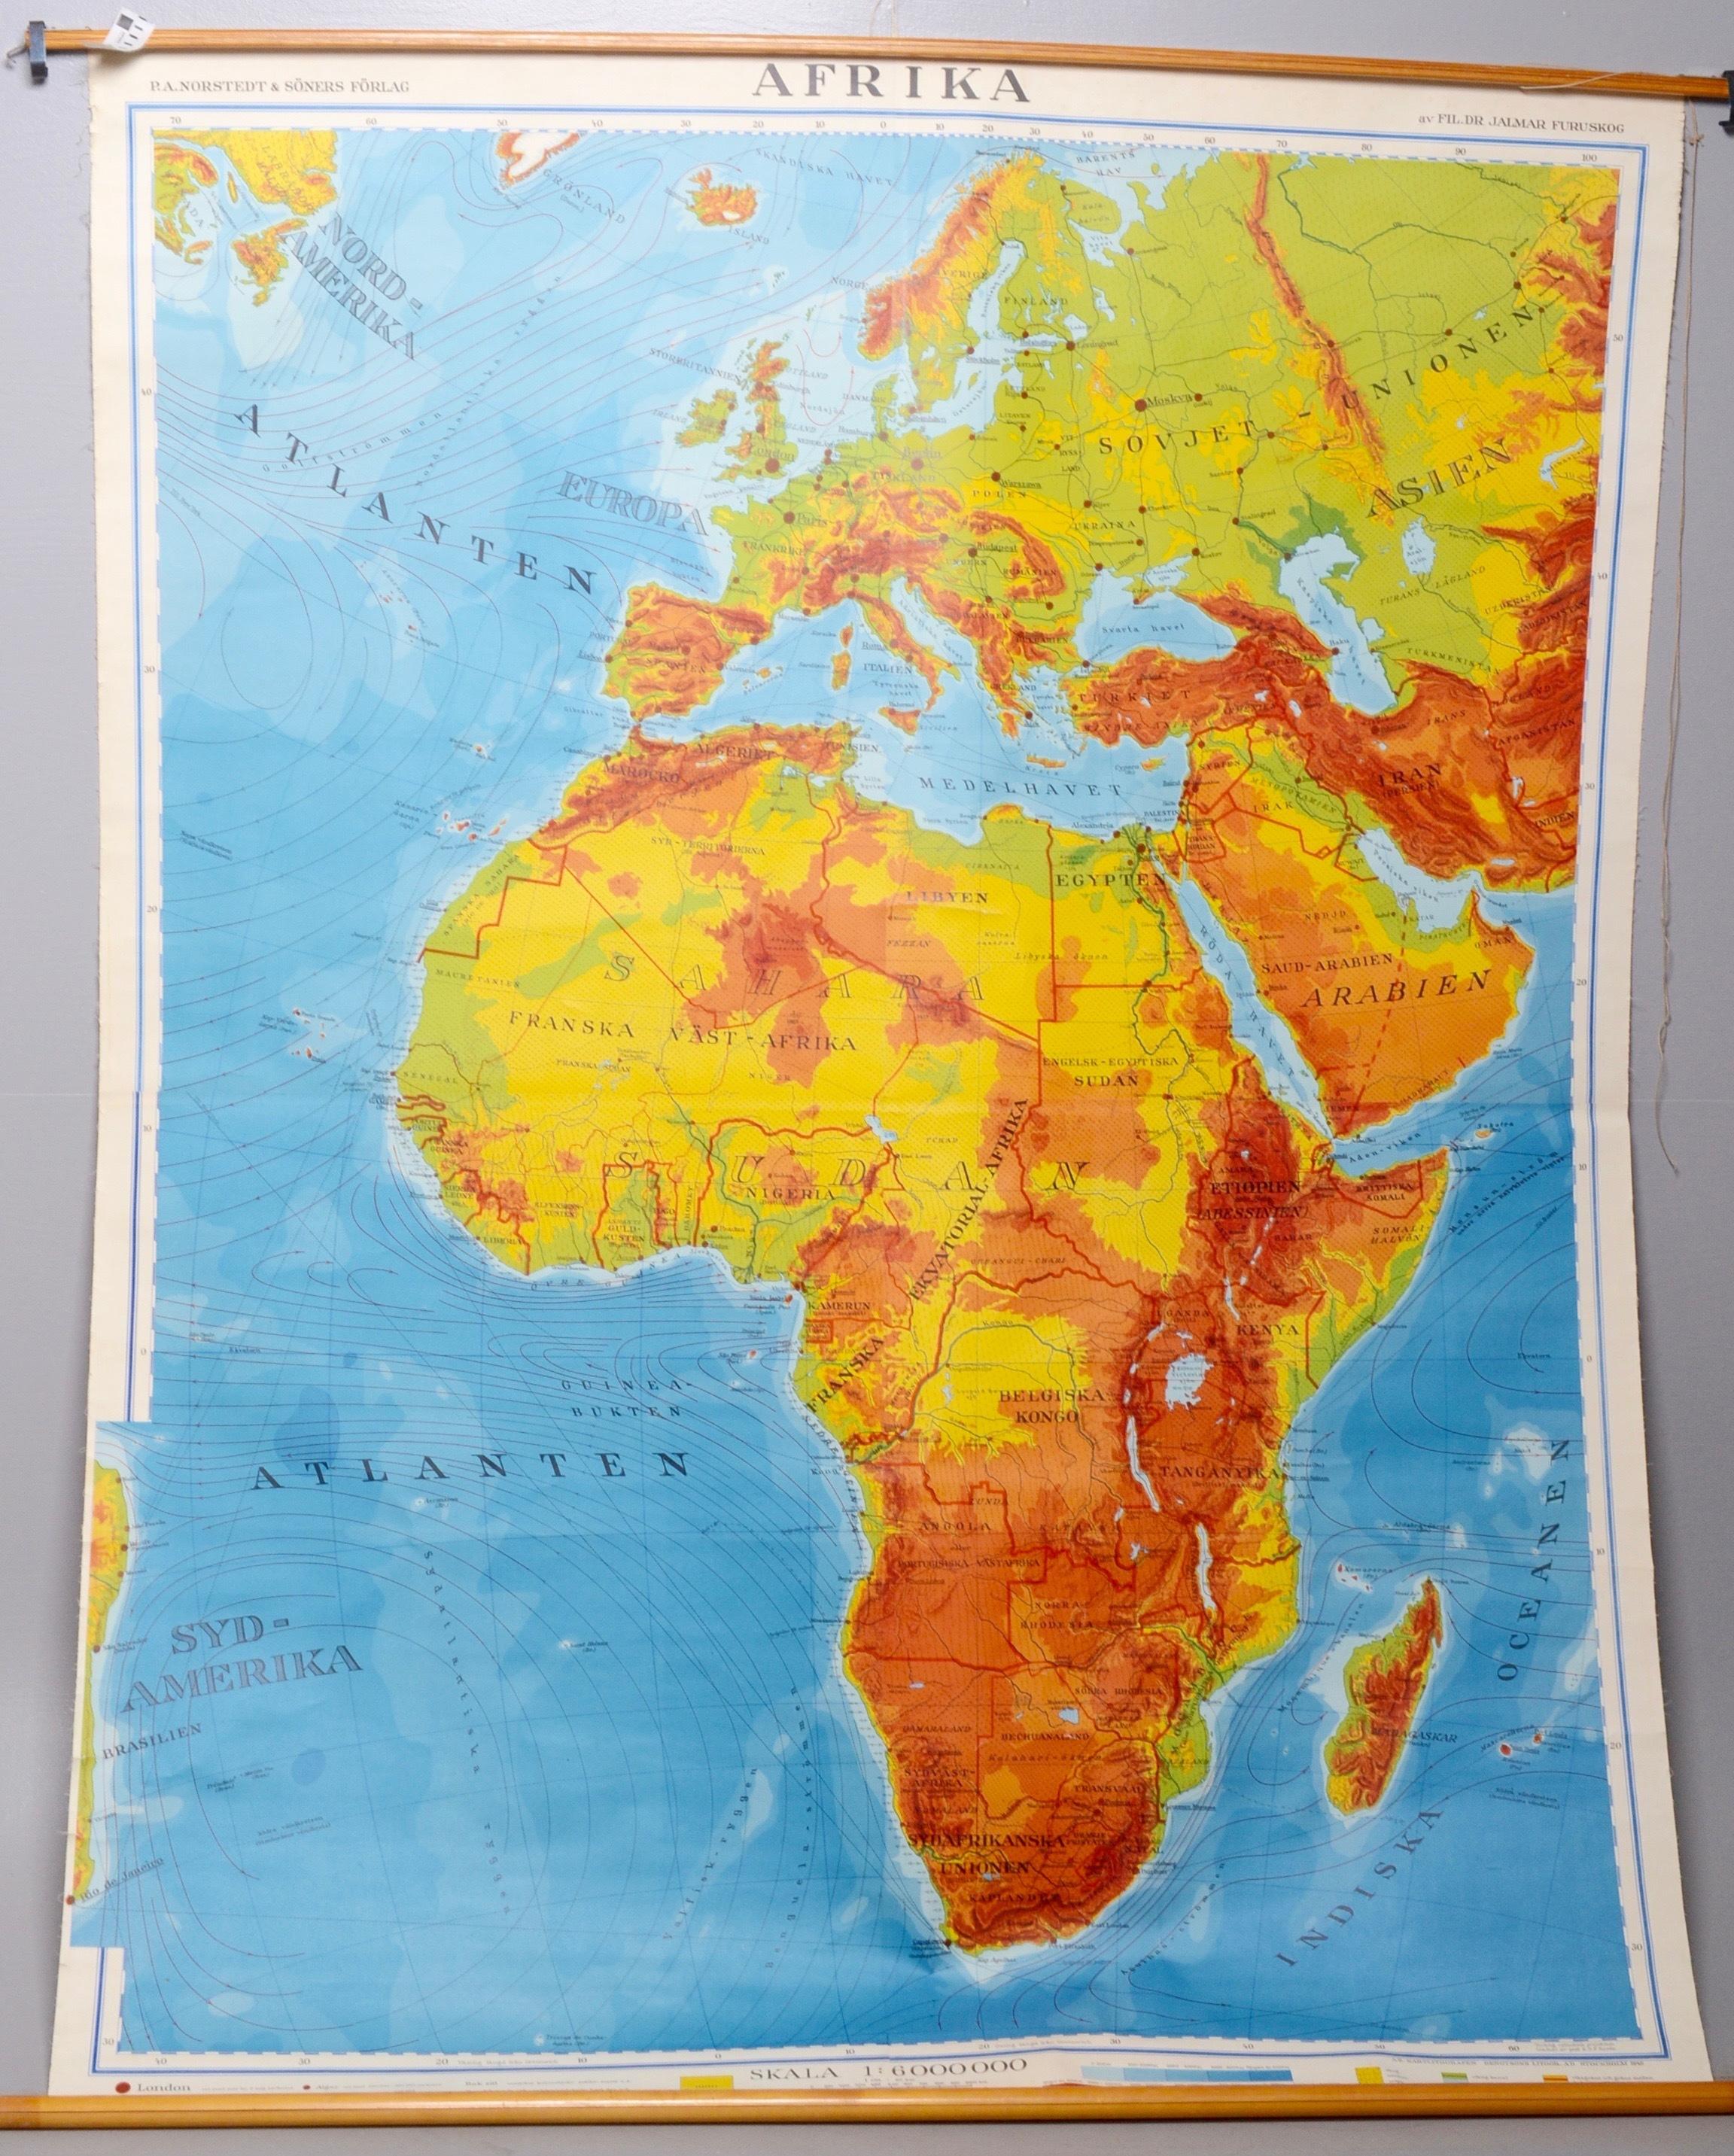 Karta Aten.Karta Nordstedt Books Maps Manuscripts Auctionet